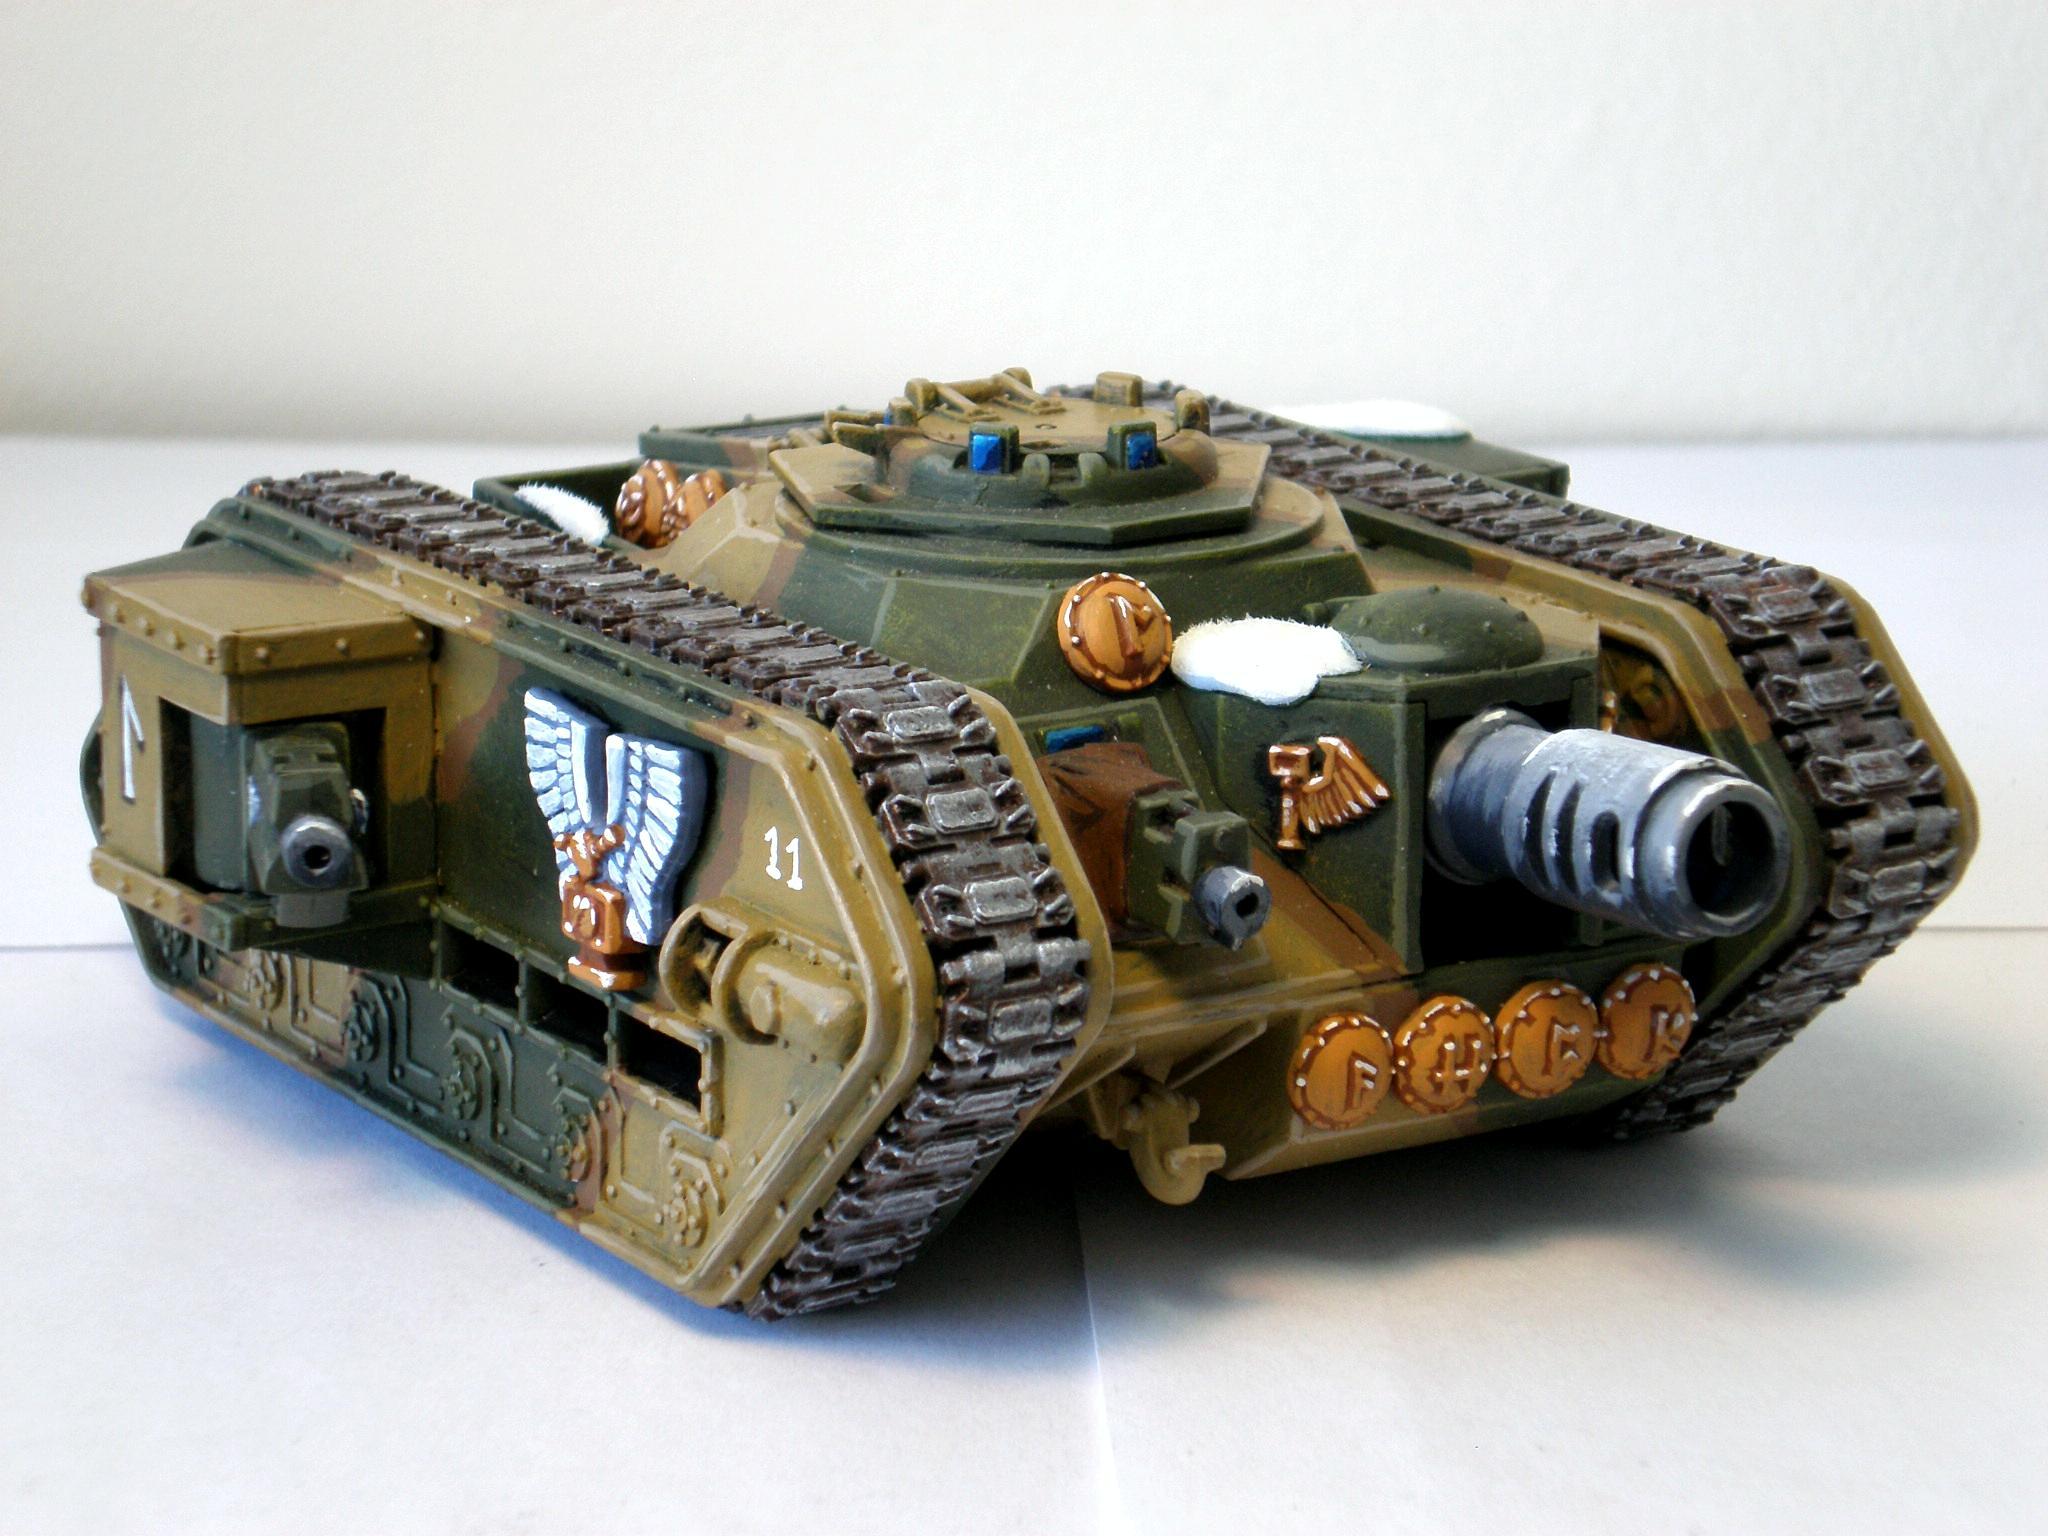 Imperial Guard, Leman Russ, Squats, Warhammer 40,000